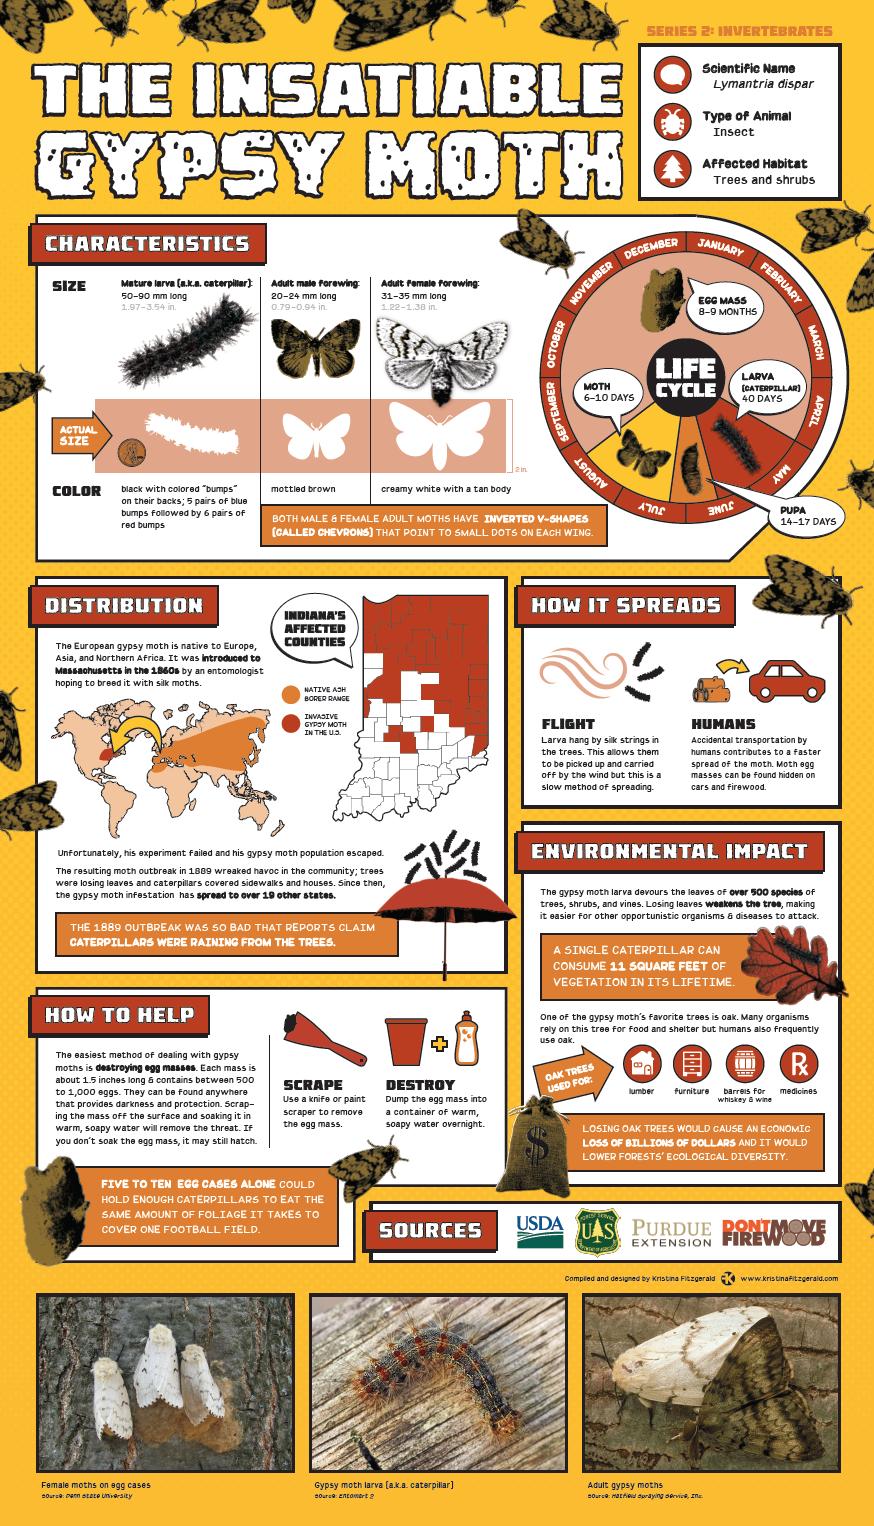 Invasive Species Posters - Gypsy Moth